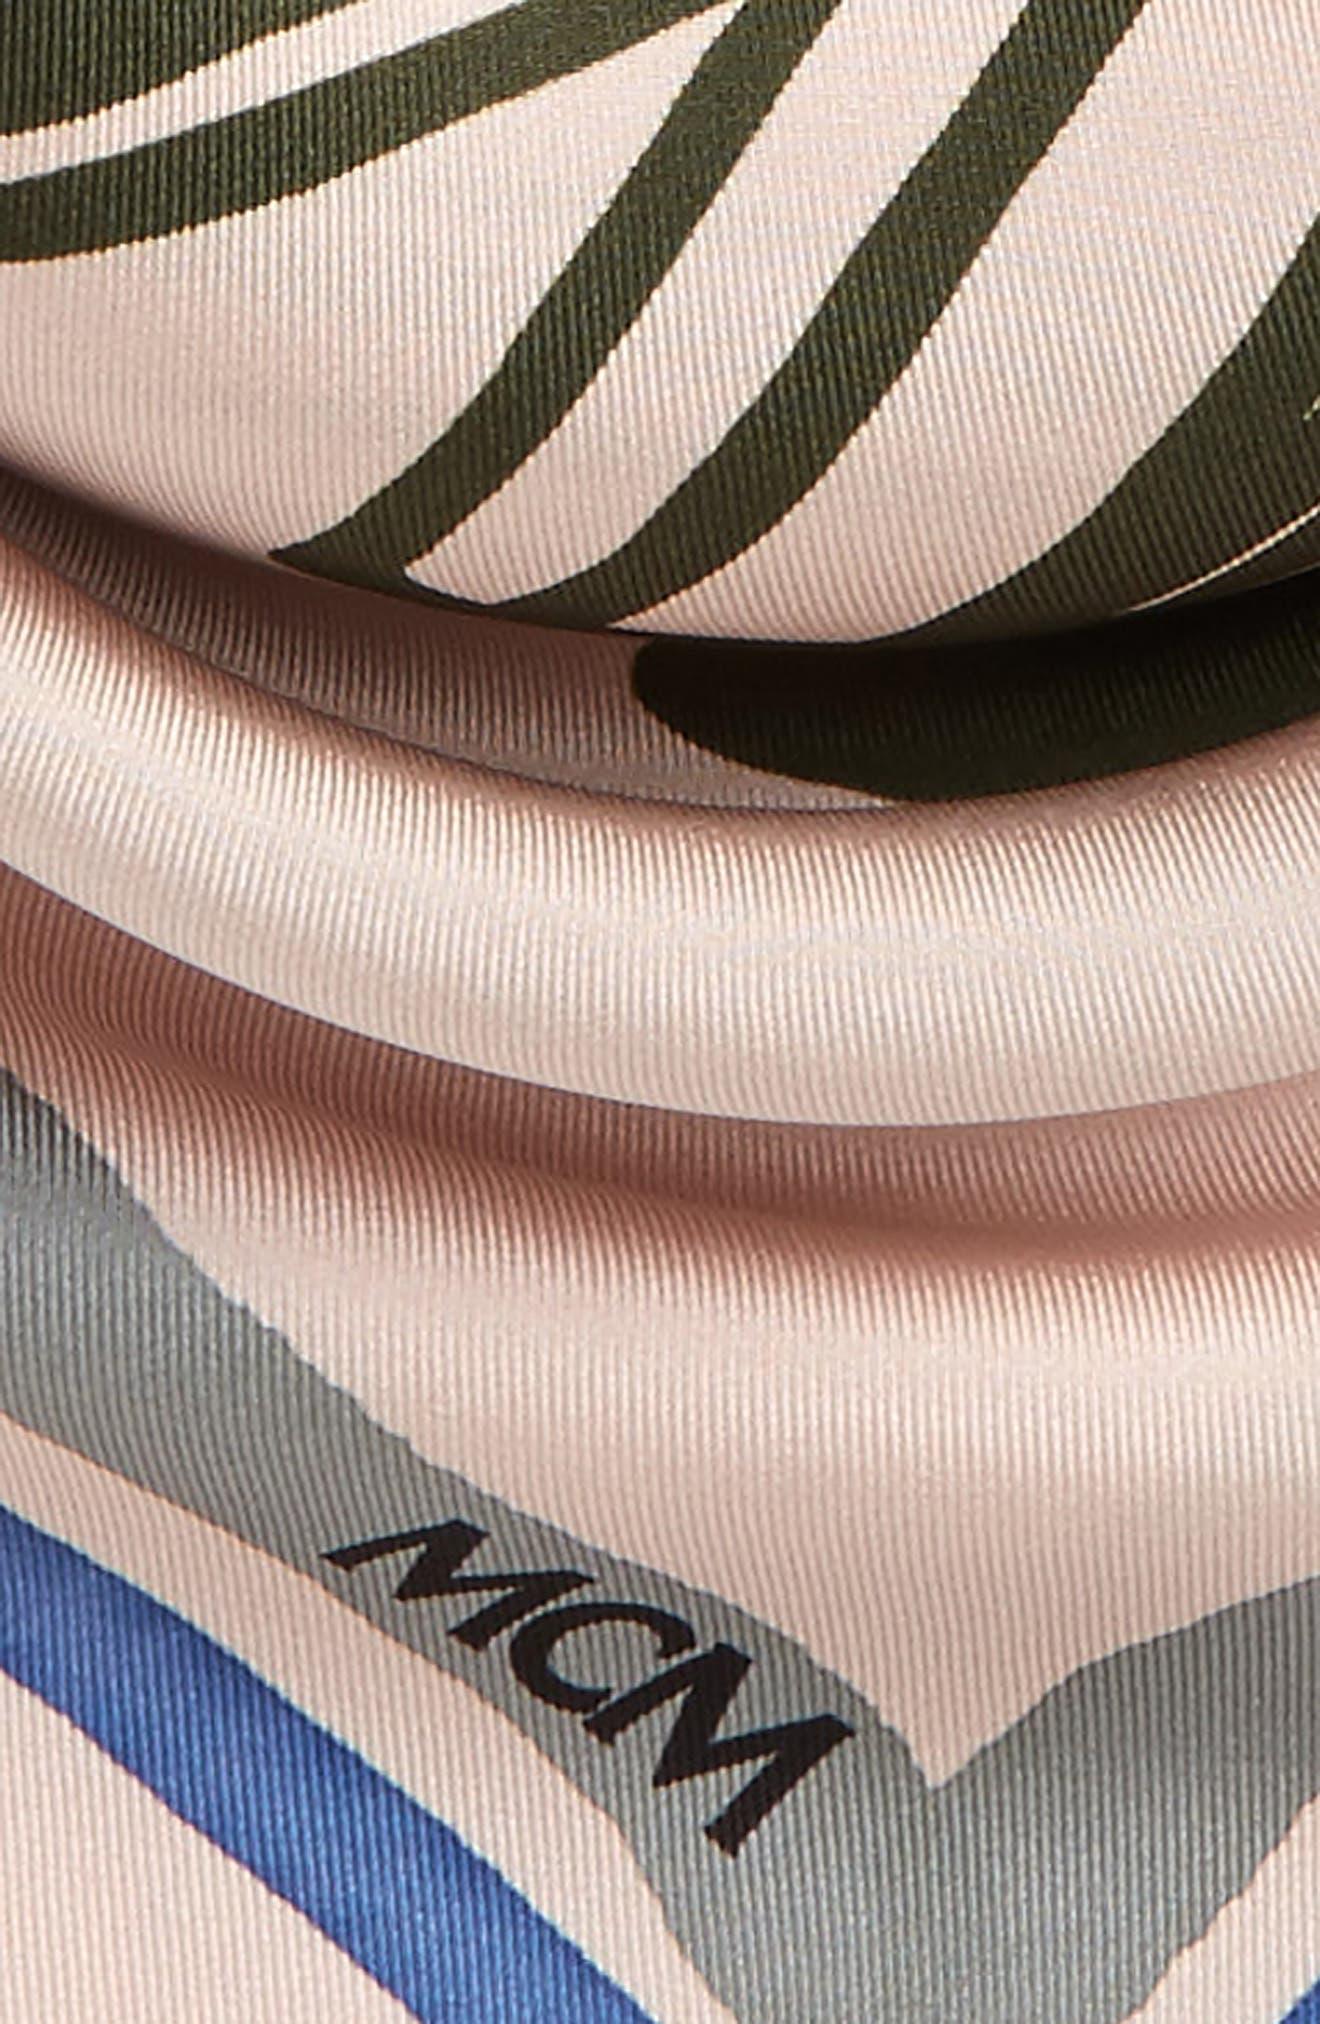 Handbag Print Square Silk Scarf,                             Alternate thumbnail 3, color,                             Dark Pink/ Mauve